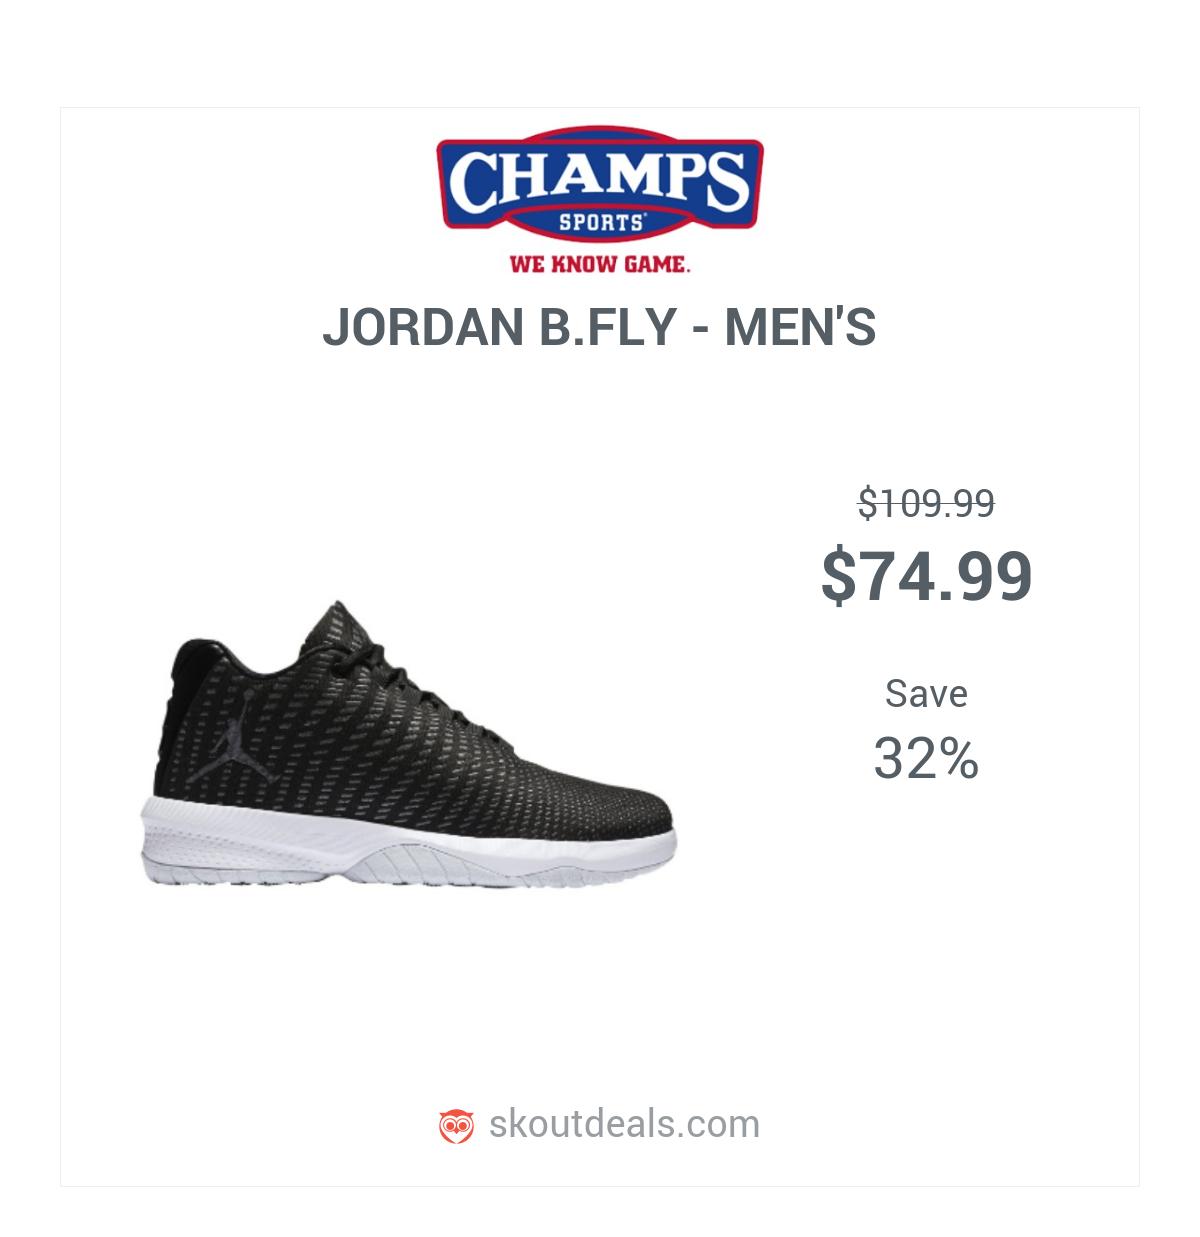 29b036bb4ff2 The Jordan B.Fly basketball shoe takes a new spin on a classic Jordan look